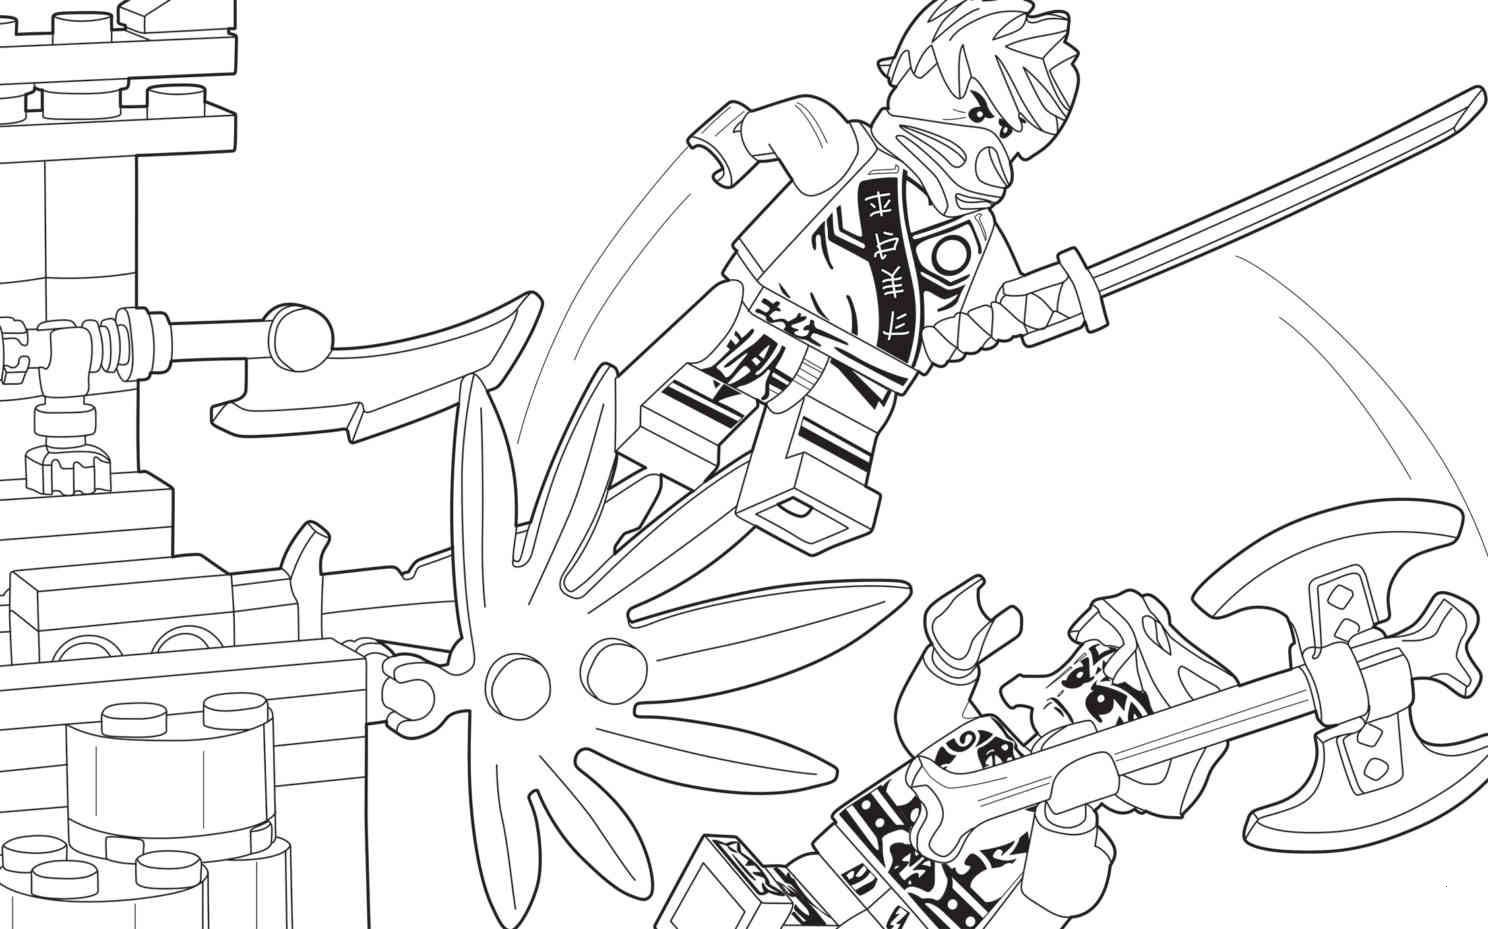 Lego Ninjago Zum Ausmalen Neu 30 Lecker Ninjago Morro Ausmalbilder – Malvorlagen Ideen Fotos